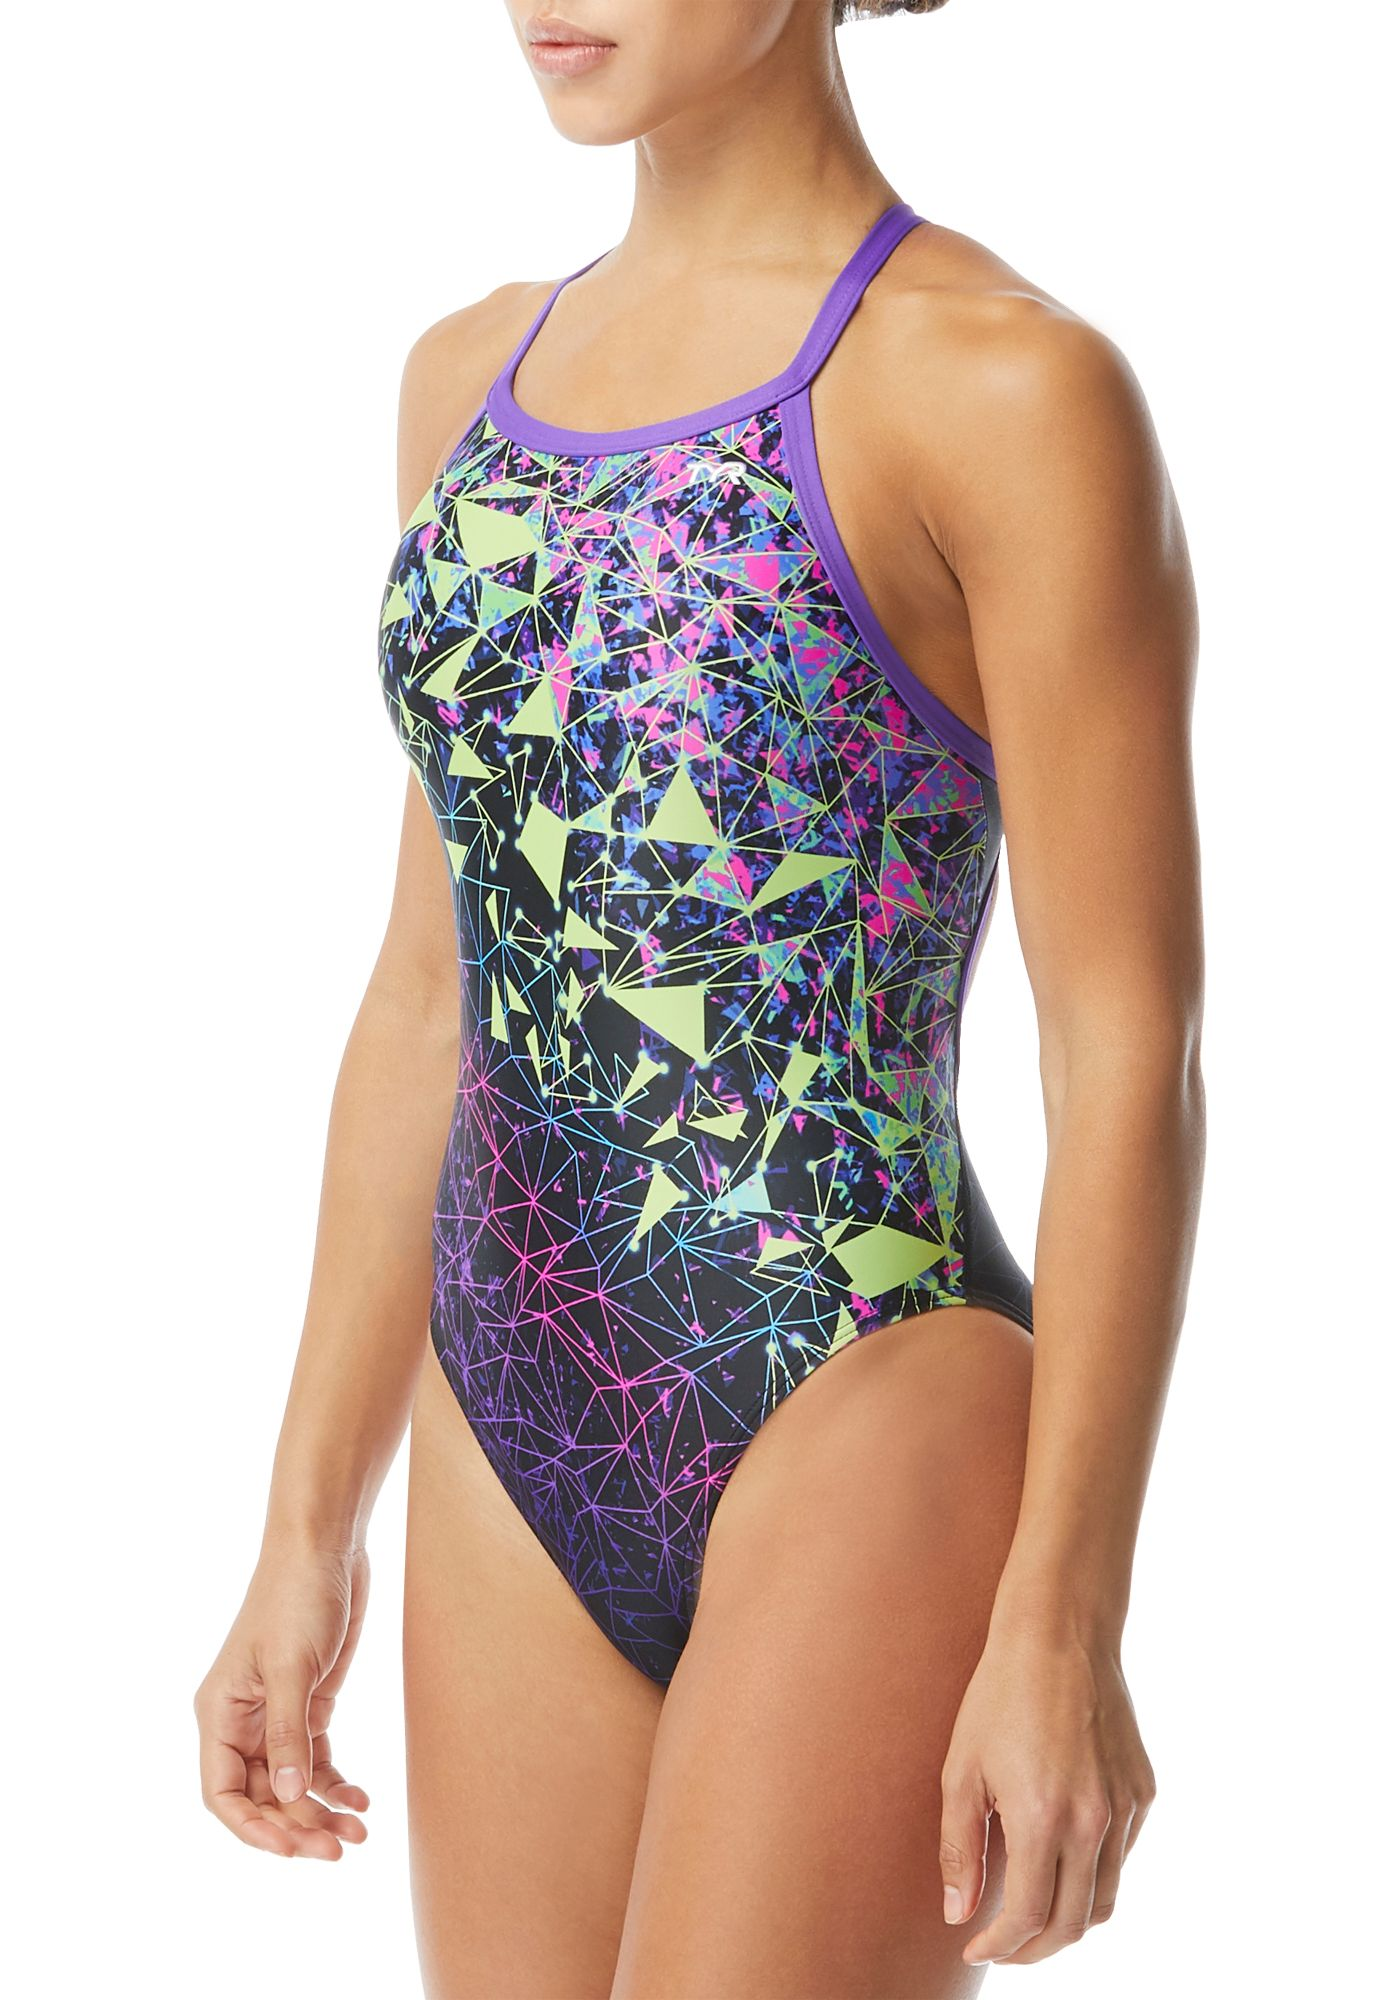 TYR Women's Orion Diamondfit One Piece Swimsuit